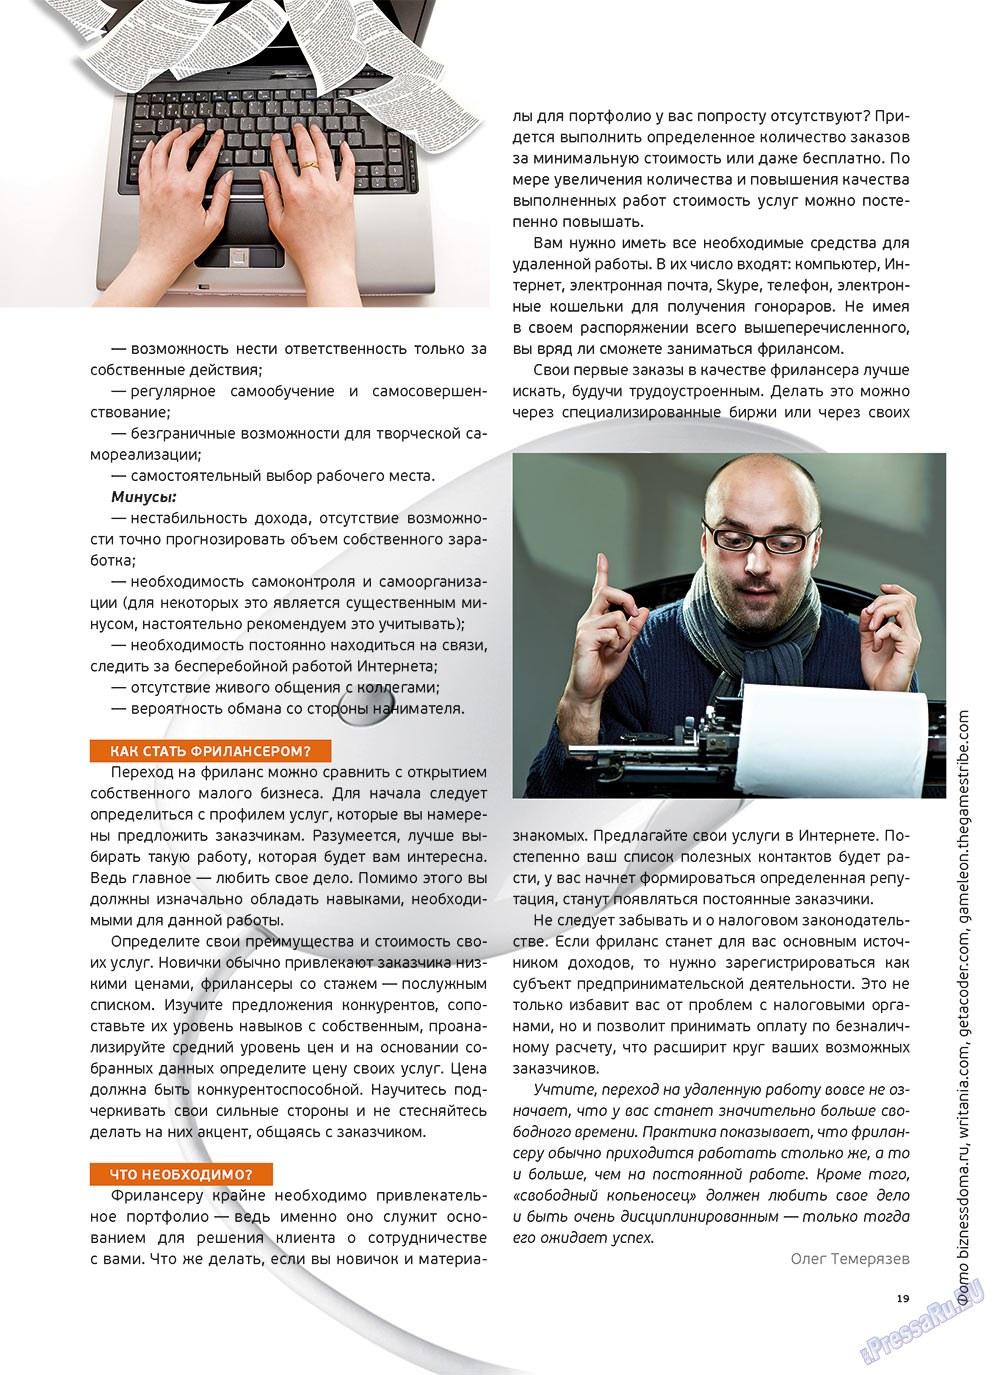 Артек (журнал). 2012 год, номер 5, стр. 21